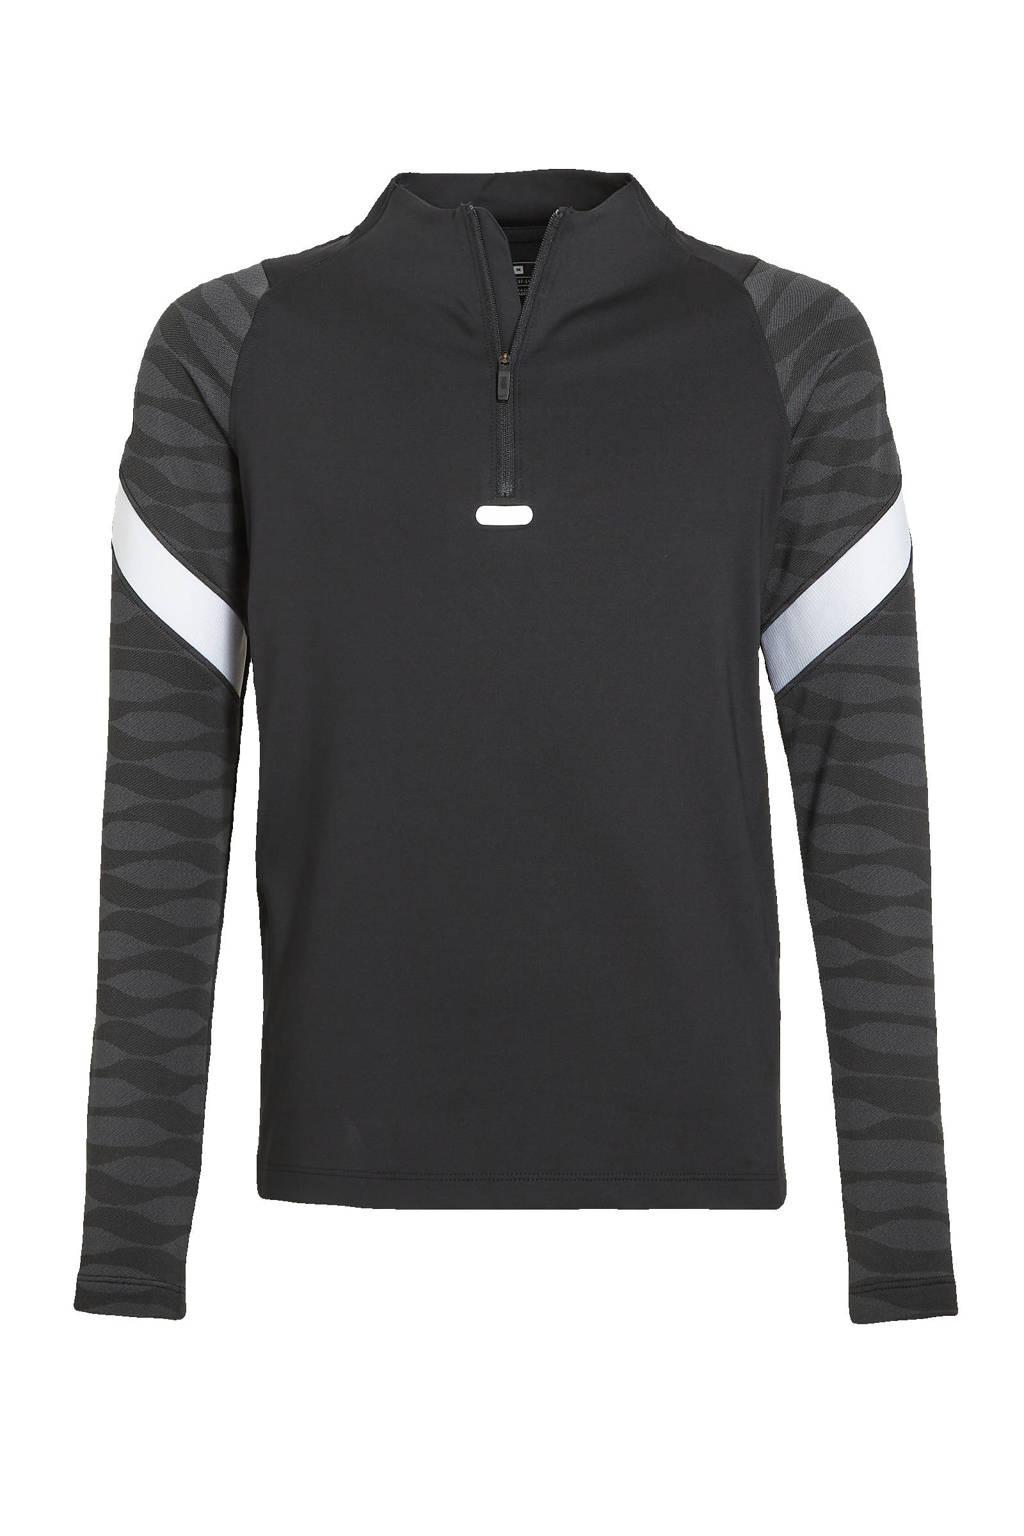 Nike   shirt zwart/antraciet/wit, Zwart/antraciet/wit